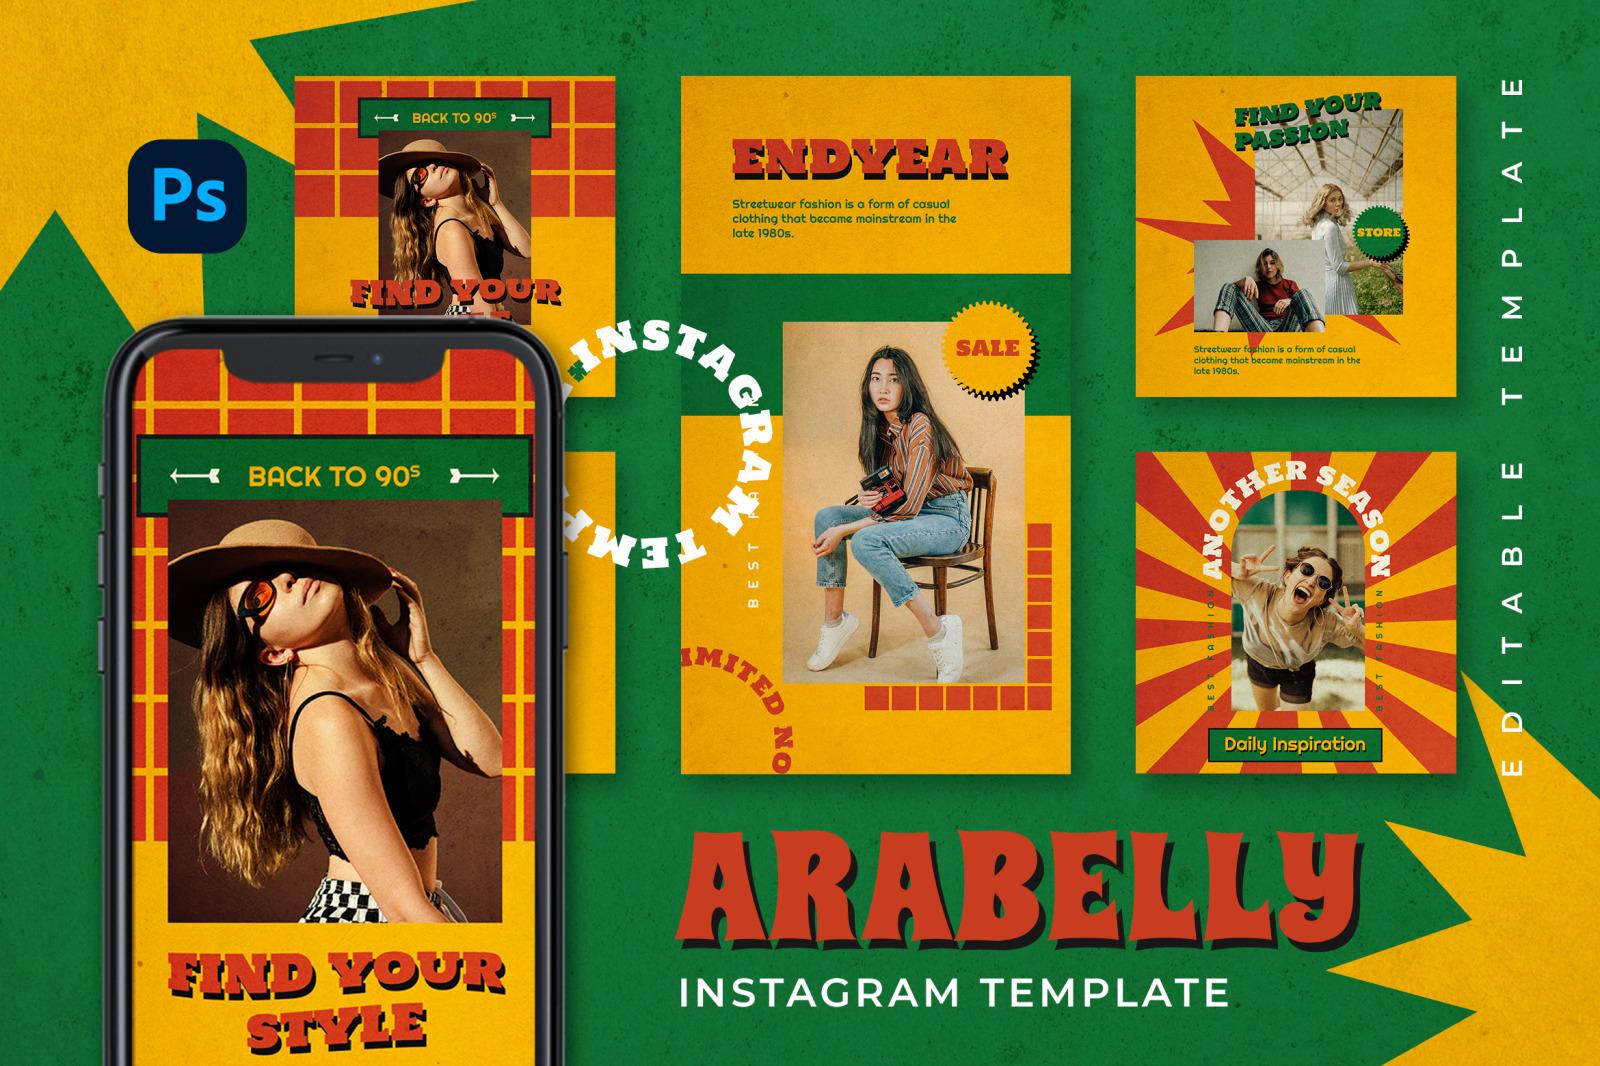 Arabelly Instagram Template